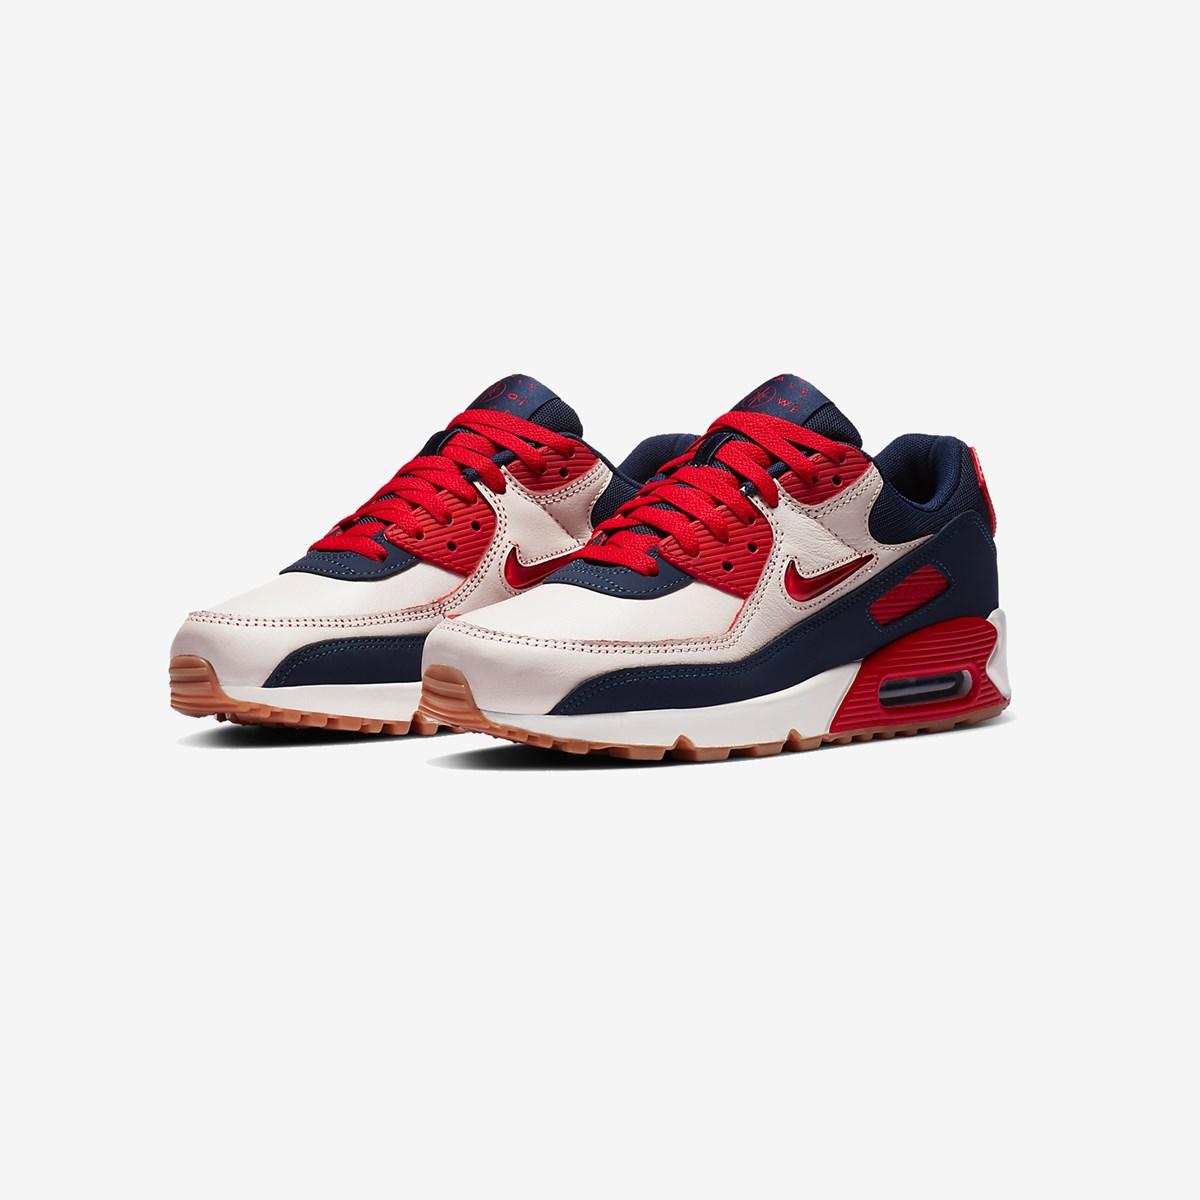 Nike Air Max 90 Premium - Cj0611-101 - SNS   sneakers & streetwear online since 1999